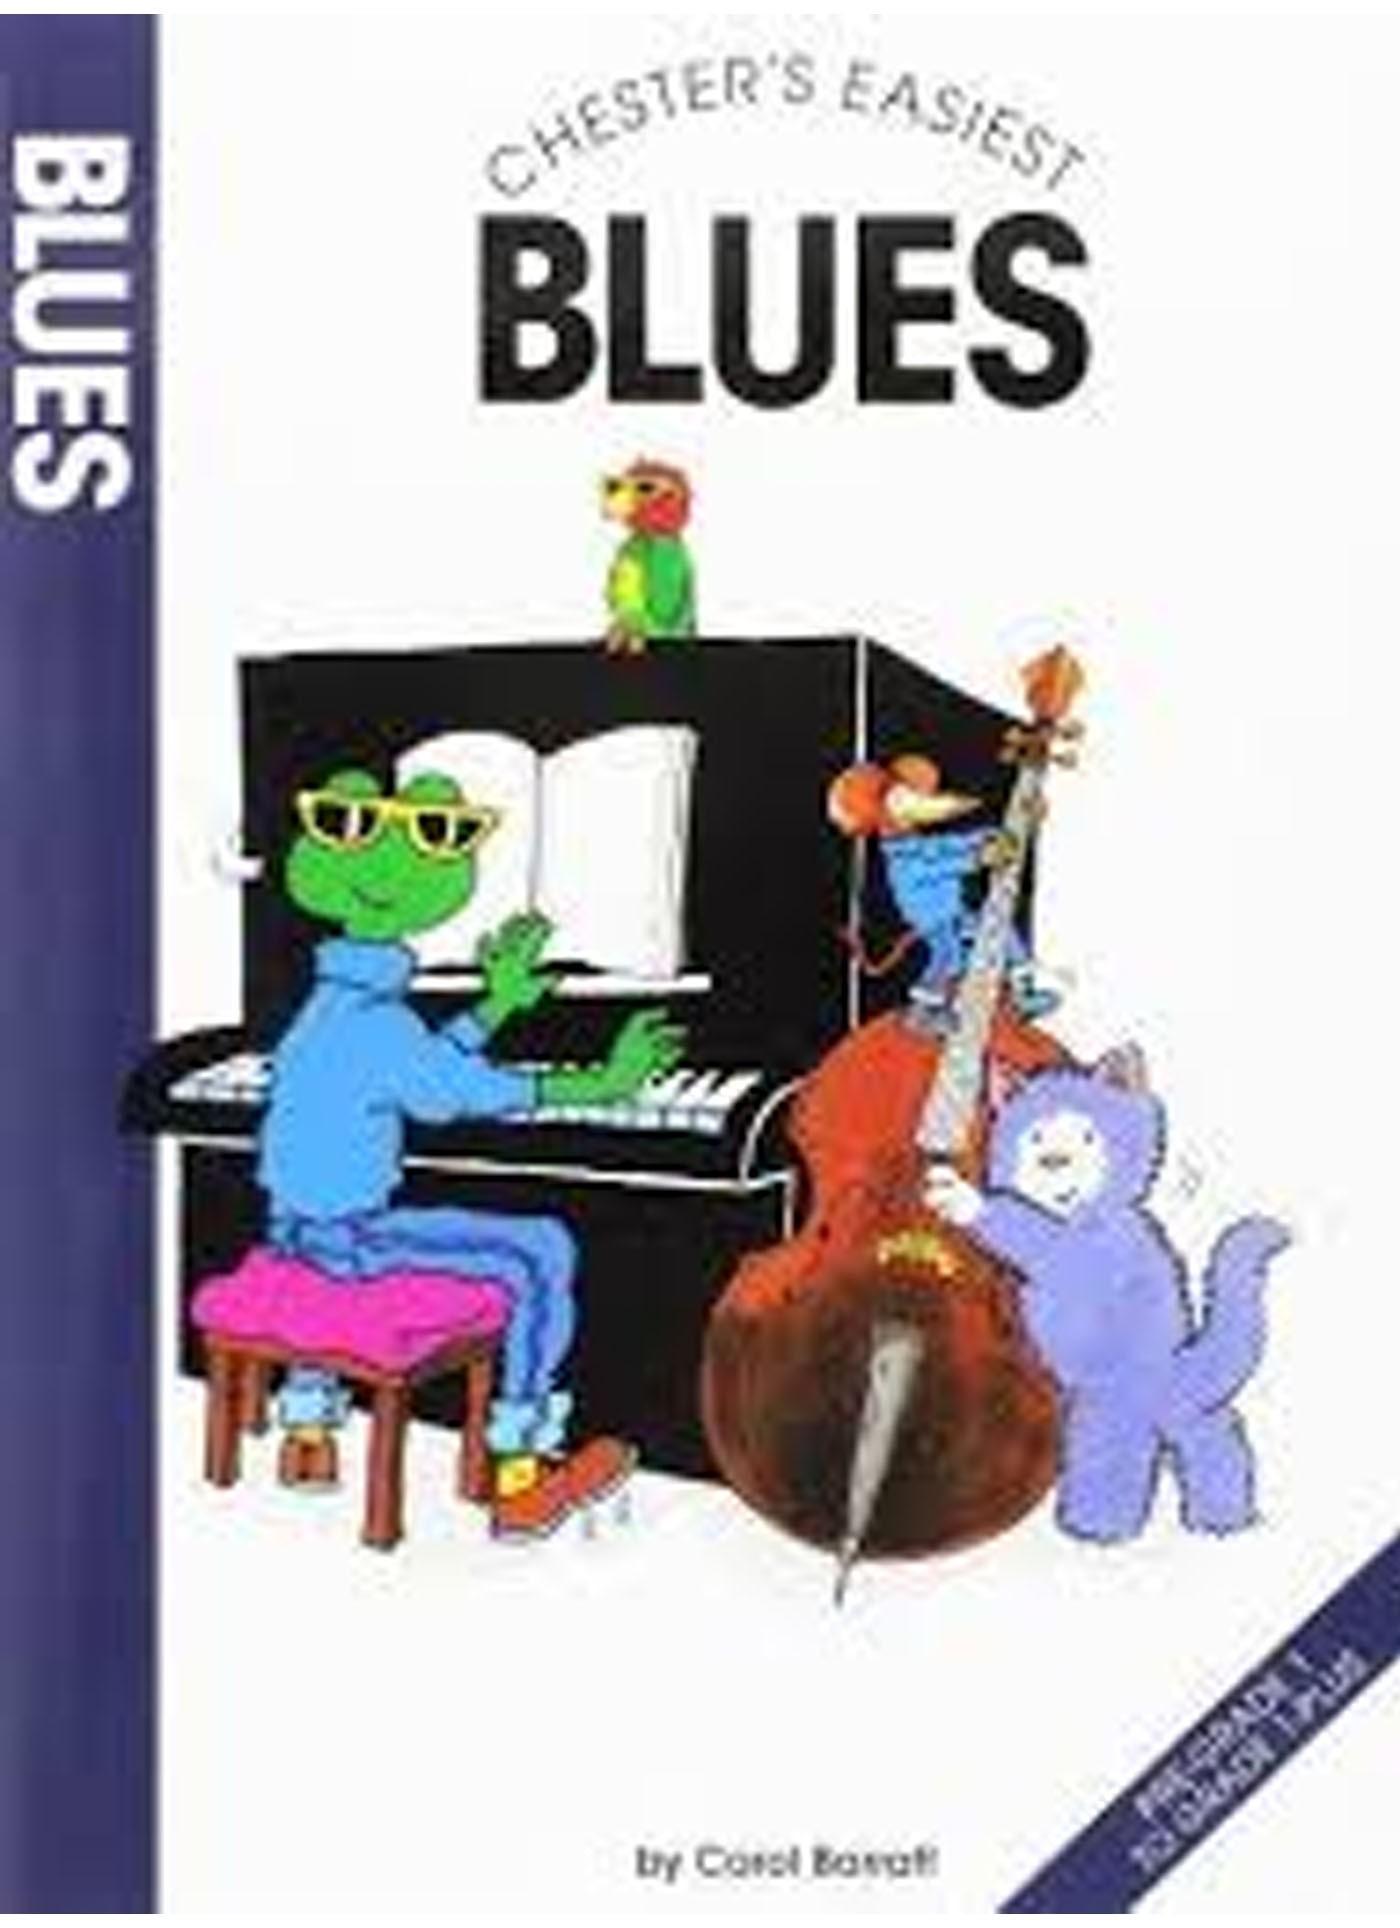 Chester's Easiest Blues Piano Book Pre-Grade 1 to Grade 1 + Carol Barratt S141